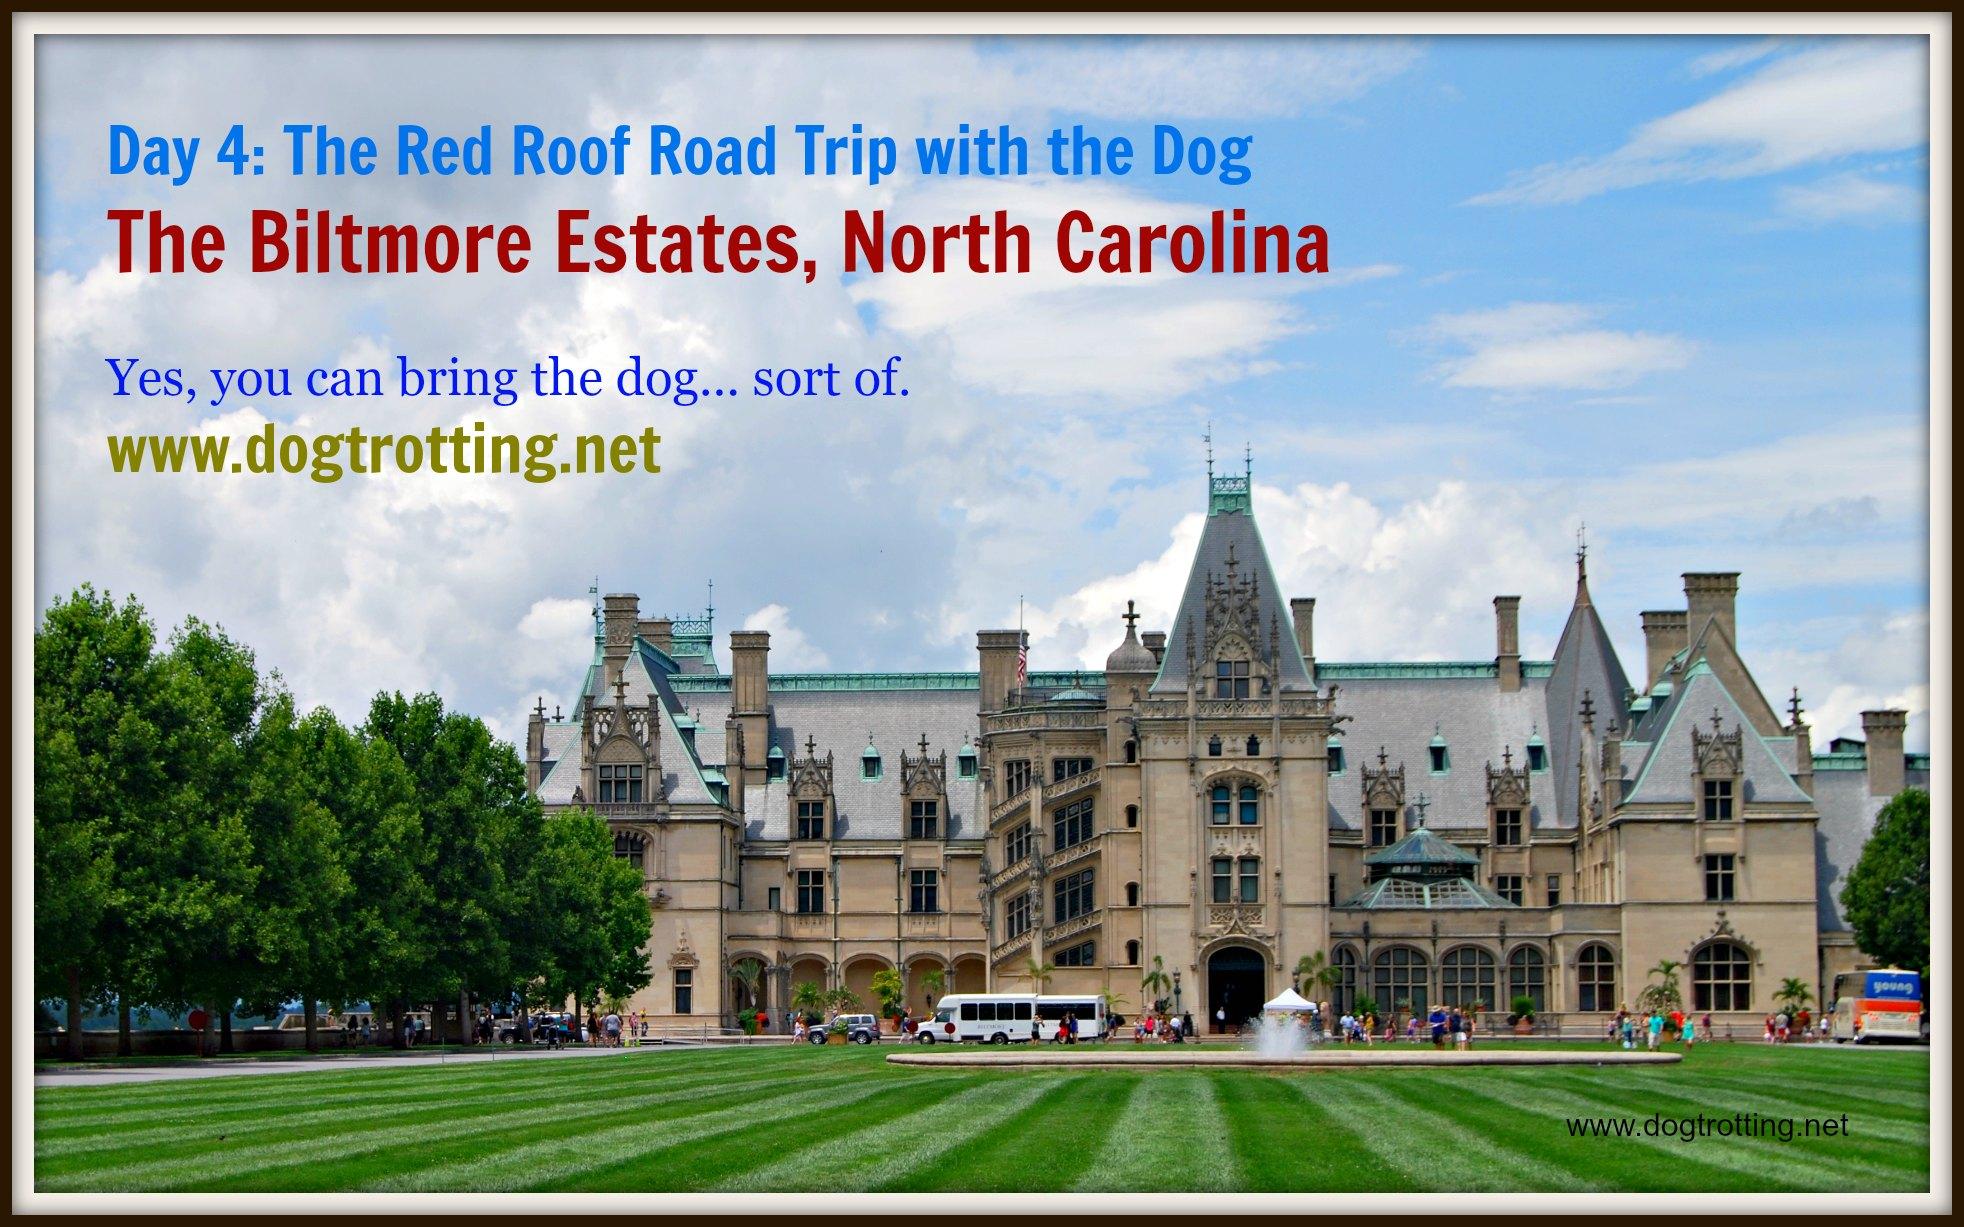 Biltmore Estates and Gardens dogtrotting.net